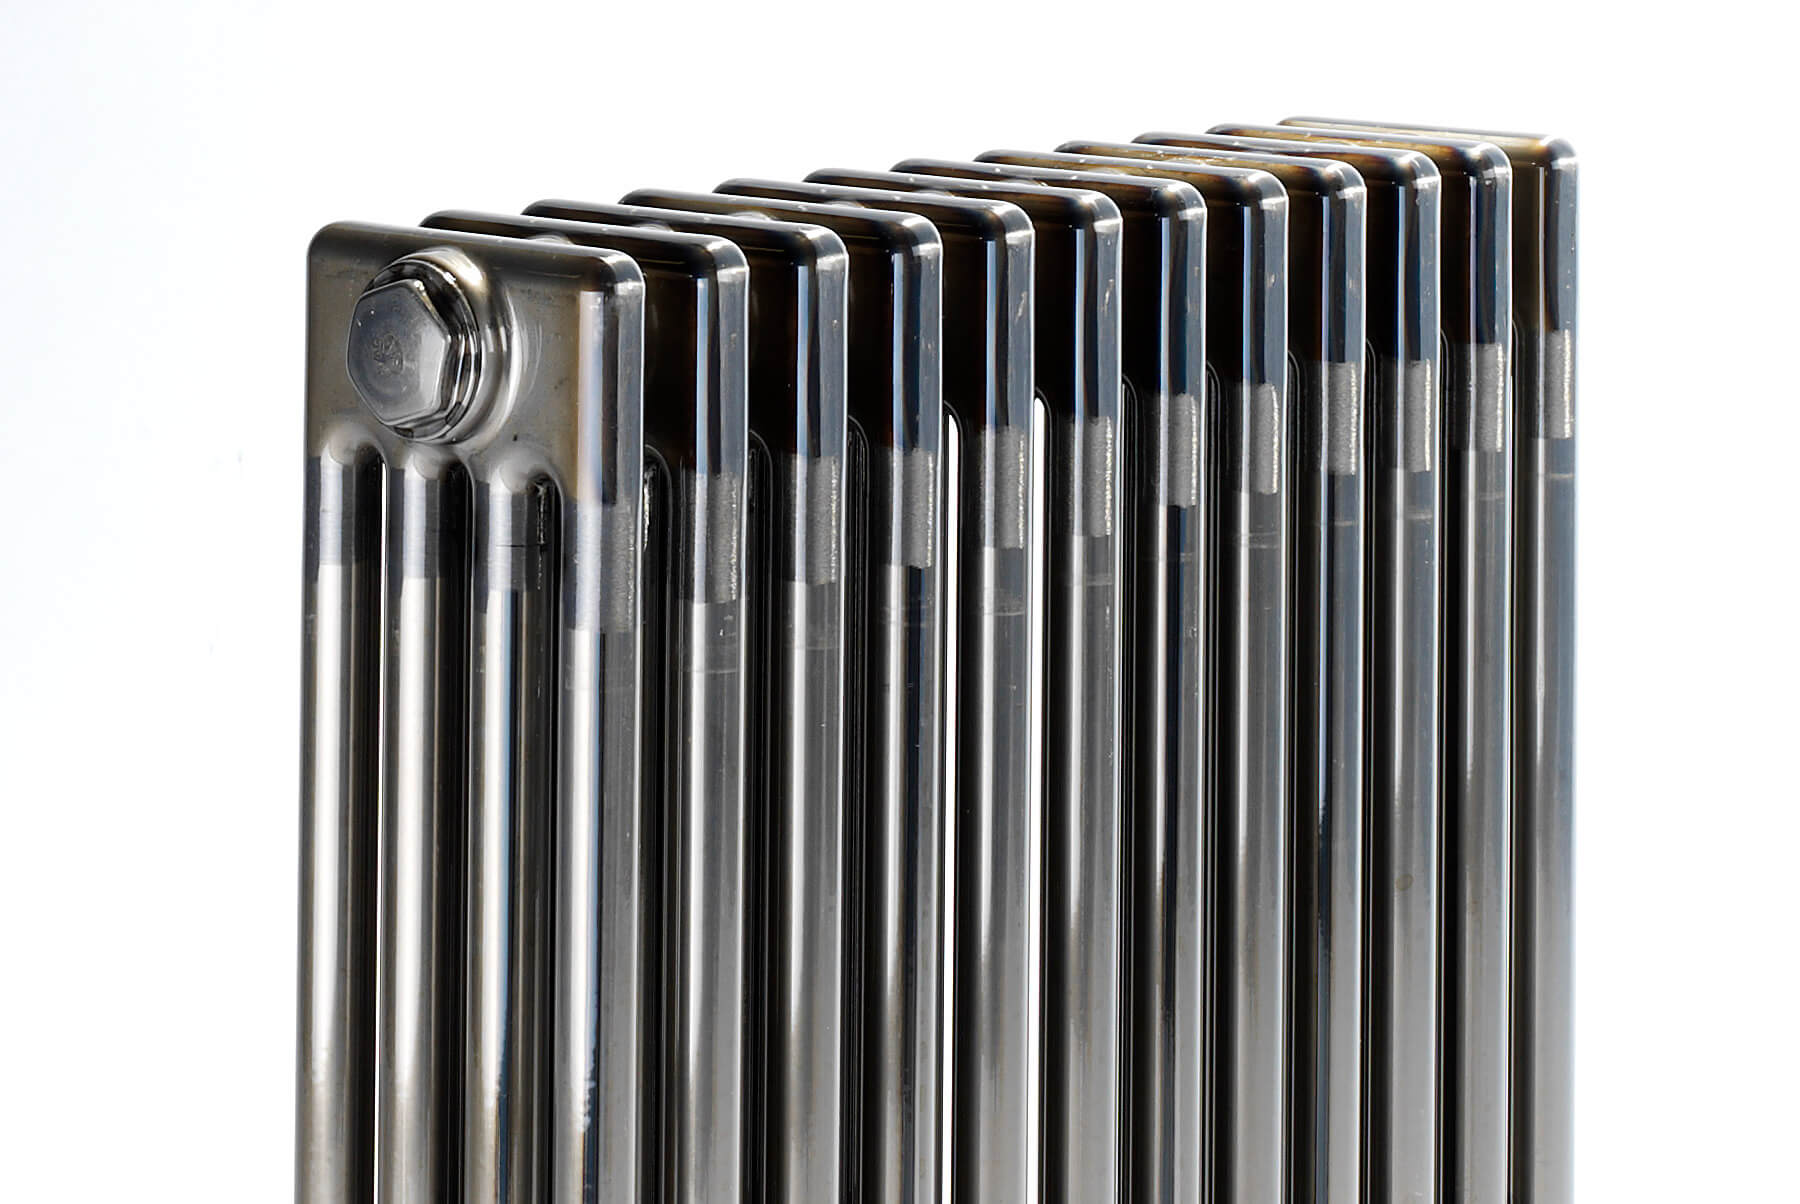 Radiators-&-Towel-Warmers-BISQUE-CLASSIC-INSET-3-1800x1204